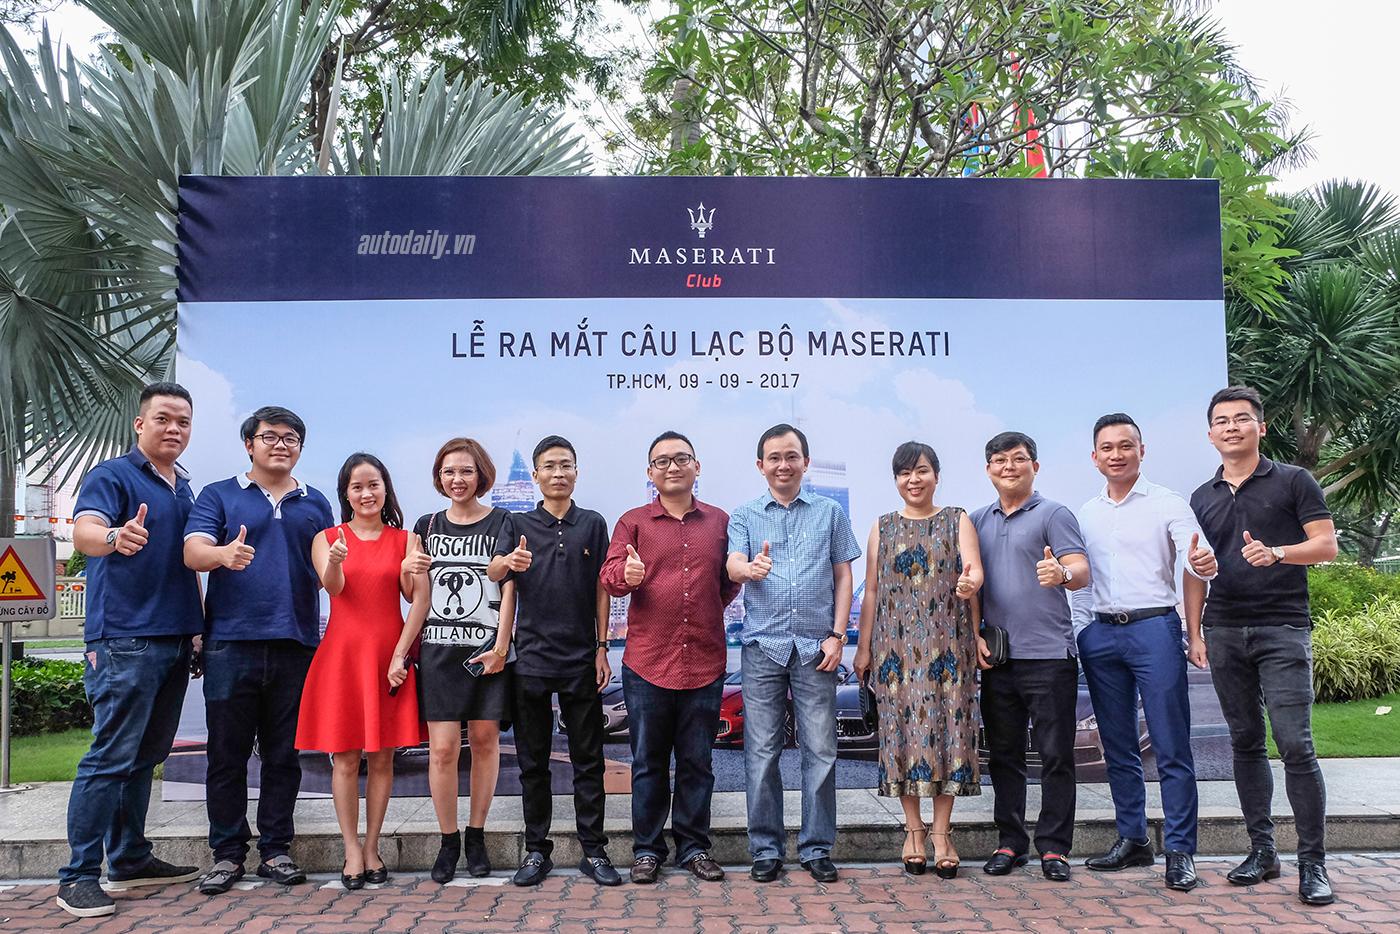 maserati-club-3.jpg